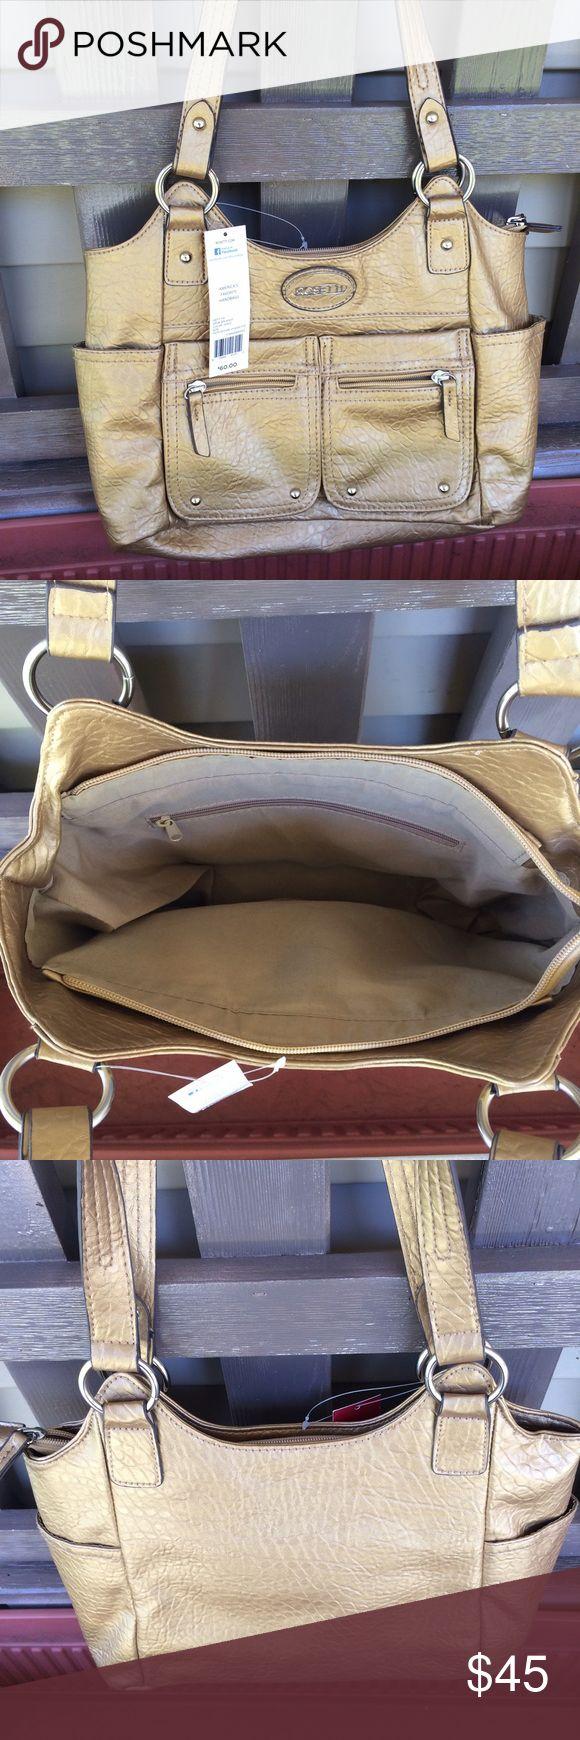 ❗️Last 1❗️Rosetti Gold Shoulder Bag Handbag Purse Brand new with tags. Bundle and save5%! ❌Price is firm unless bundled❌ Rosetti Bags Shoulder Bags